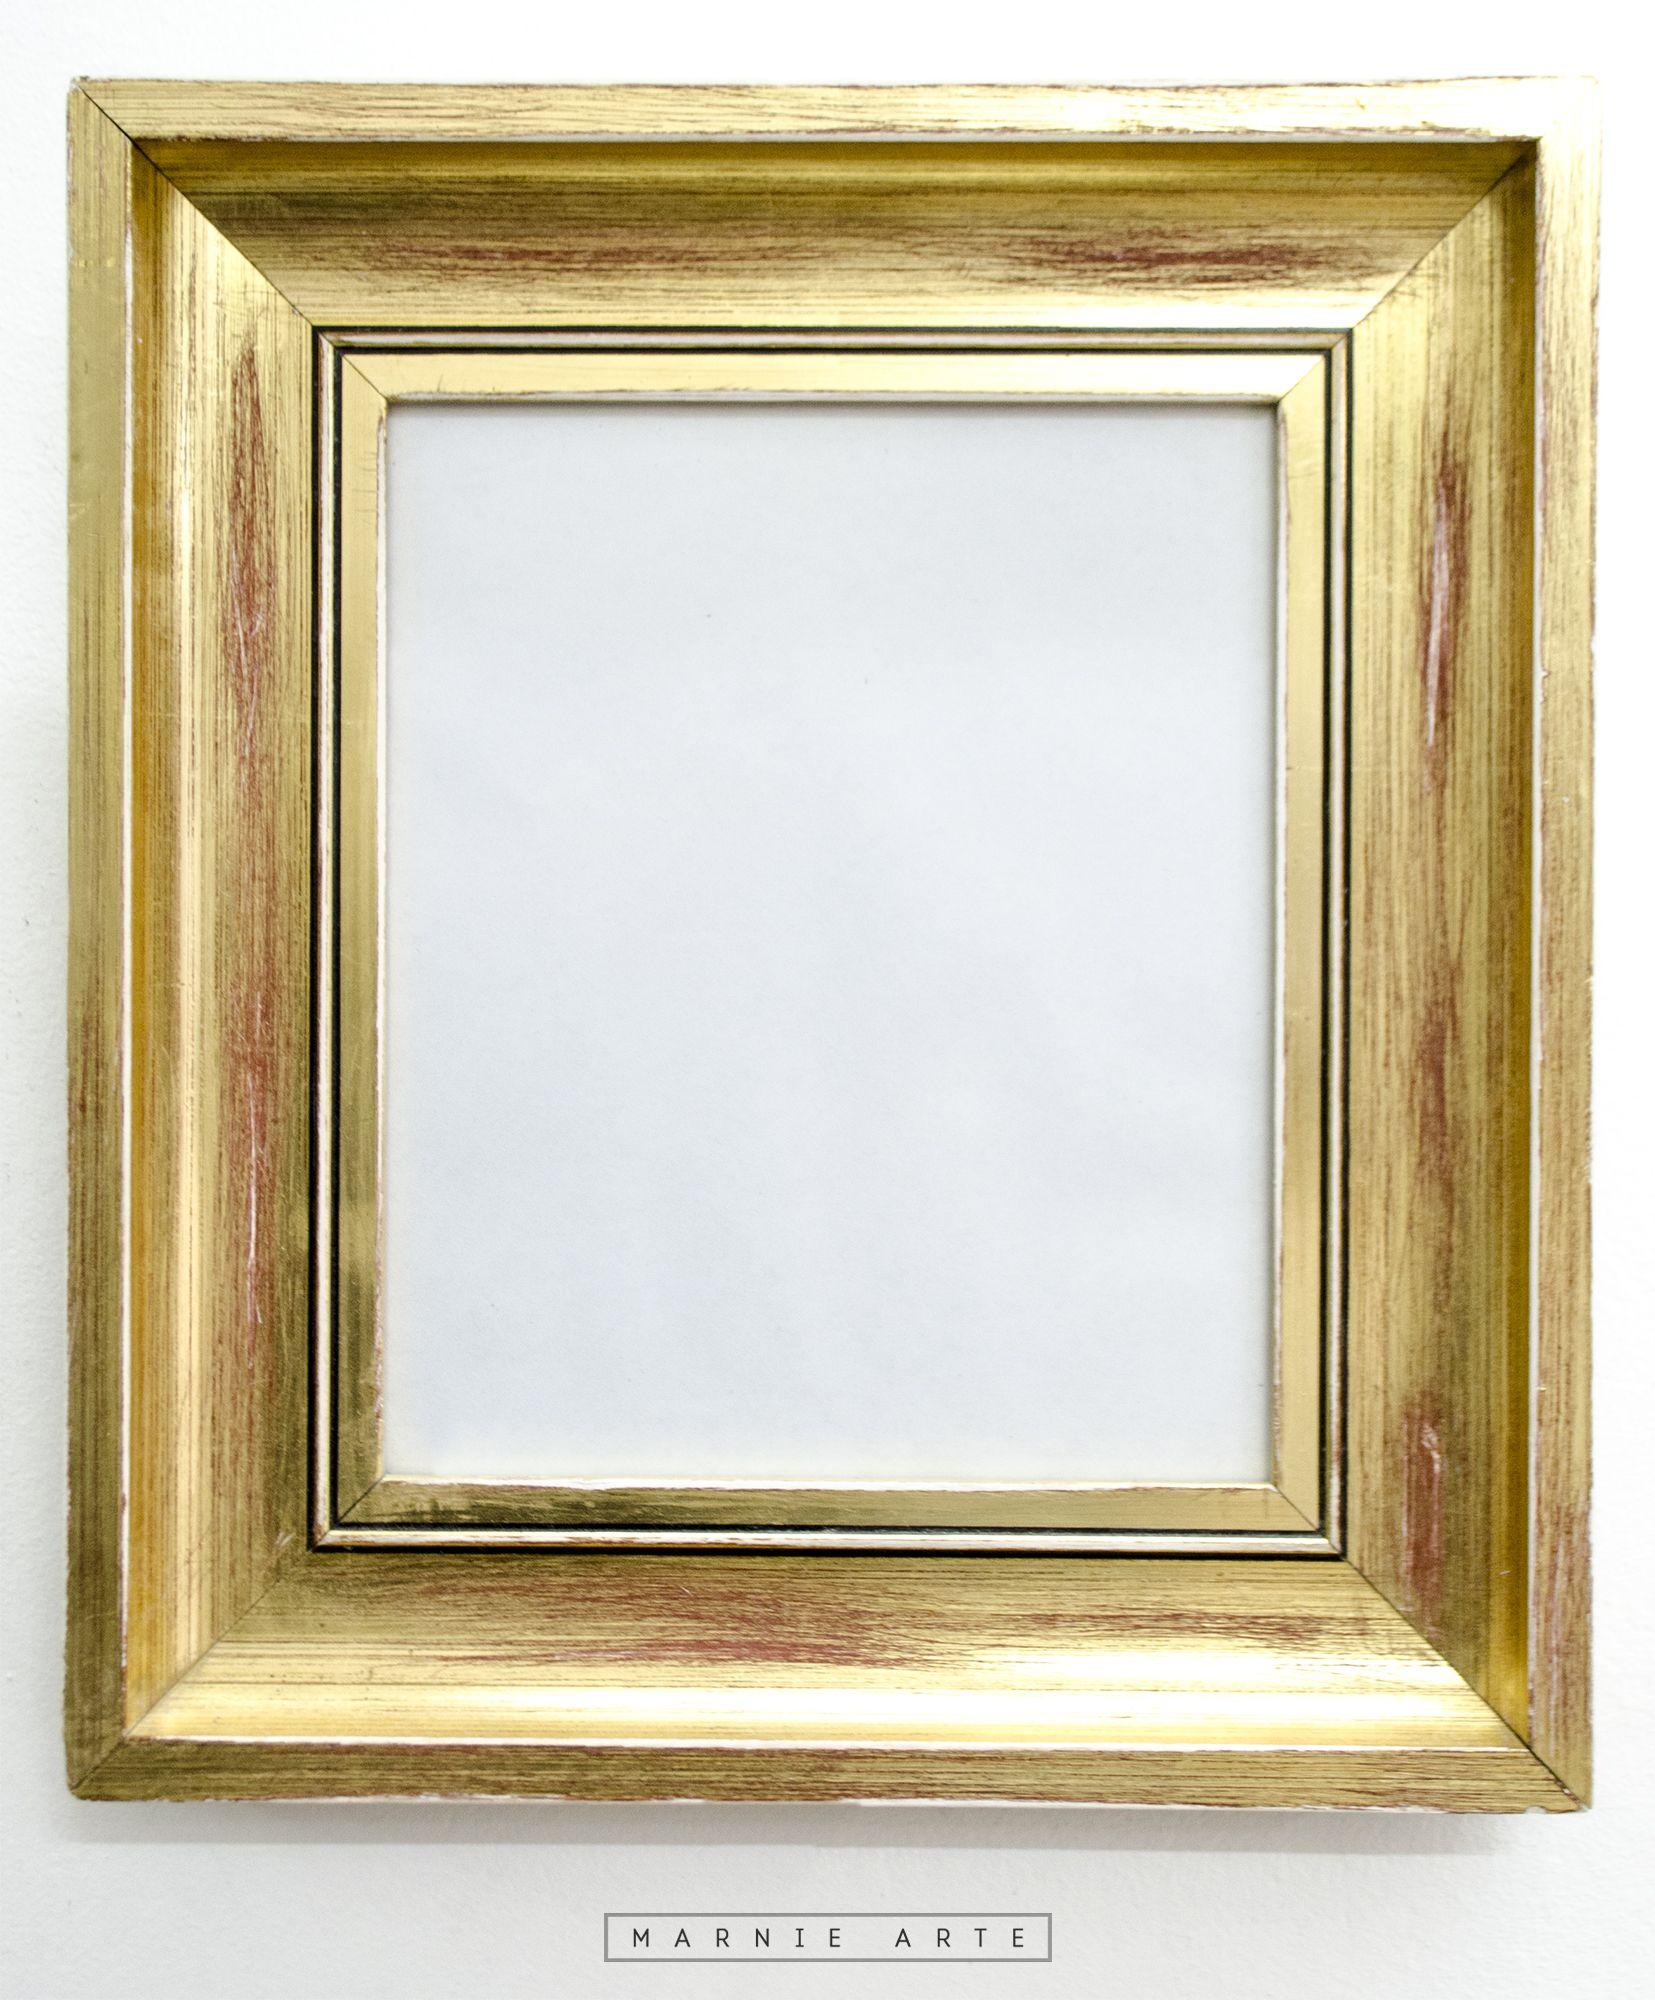 Marco dorado gastado marcos para cuadros pinterest for Marcos para cuadros